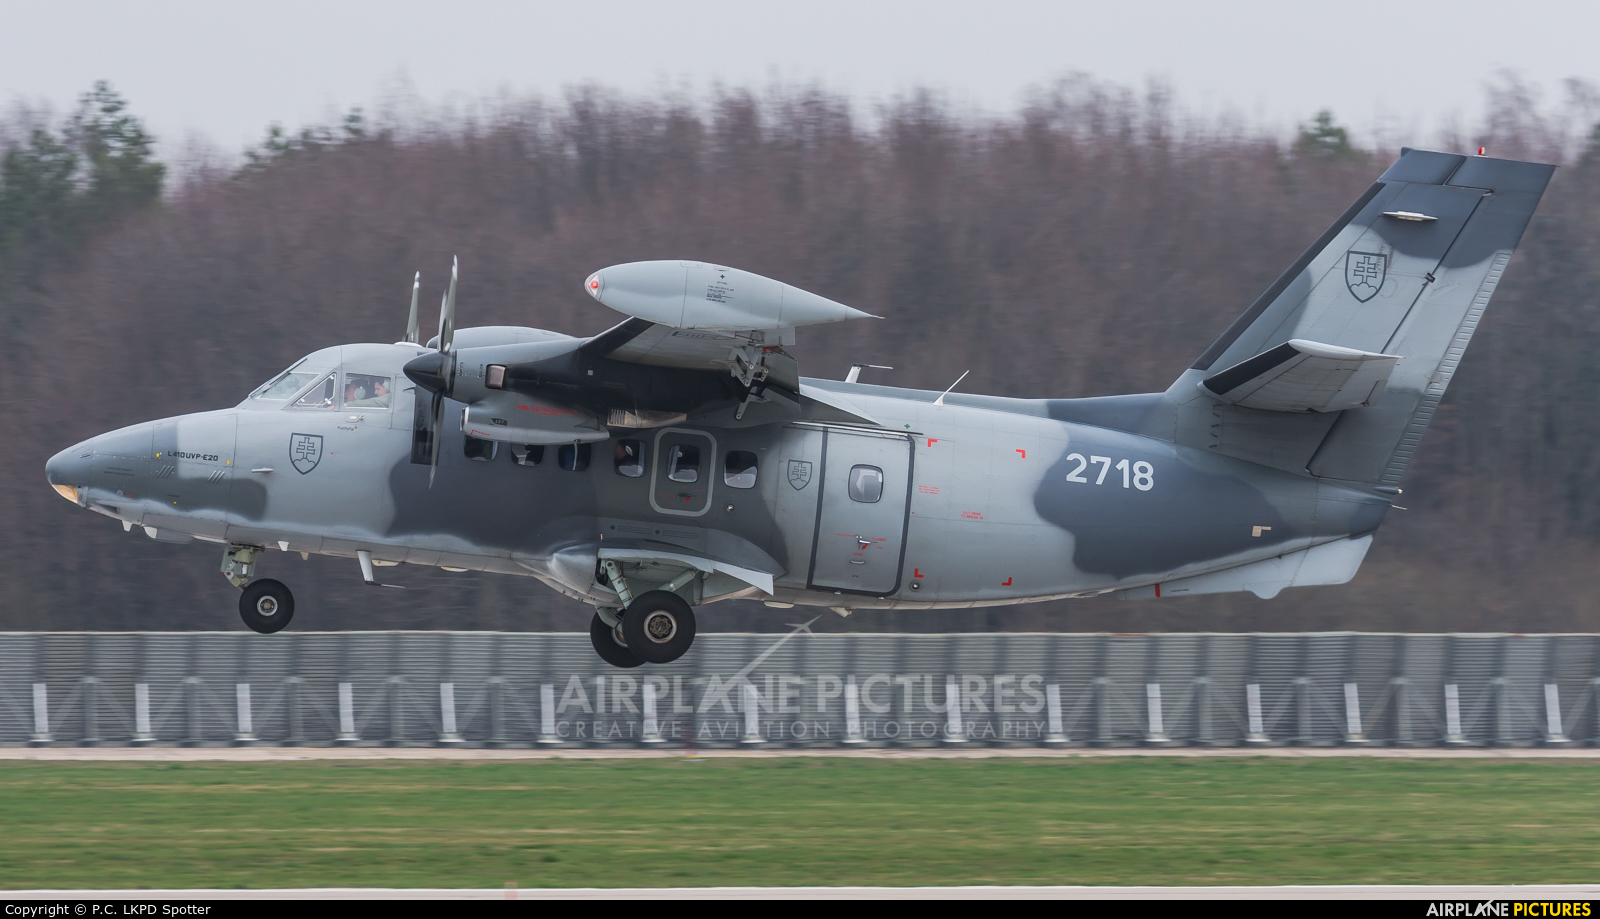 Slovakia -  Air Force 2718 aircraft at Pardubice